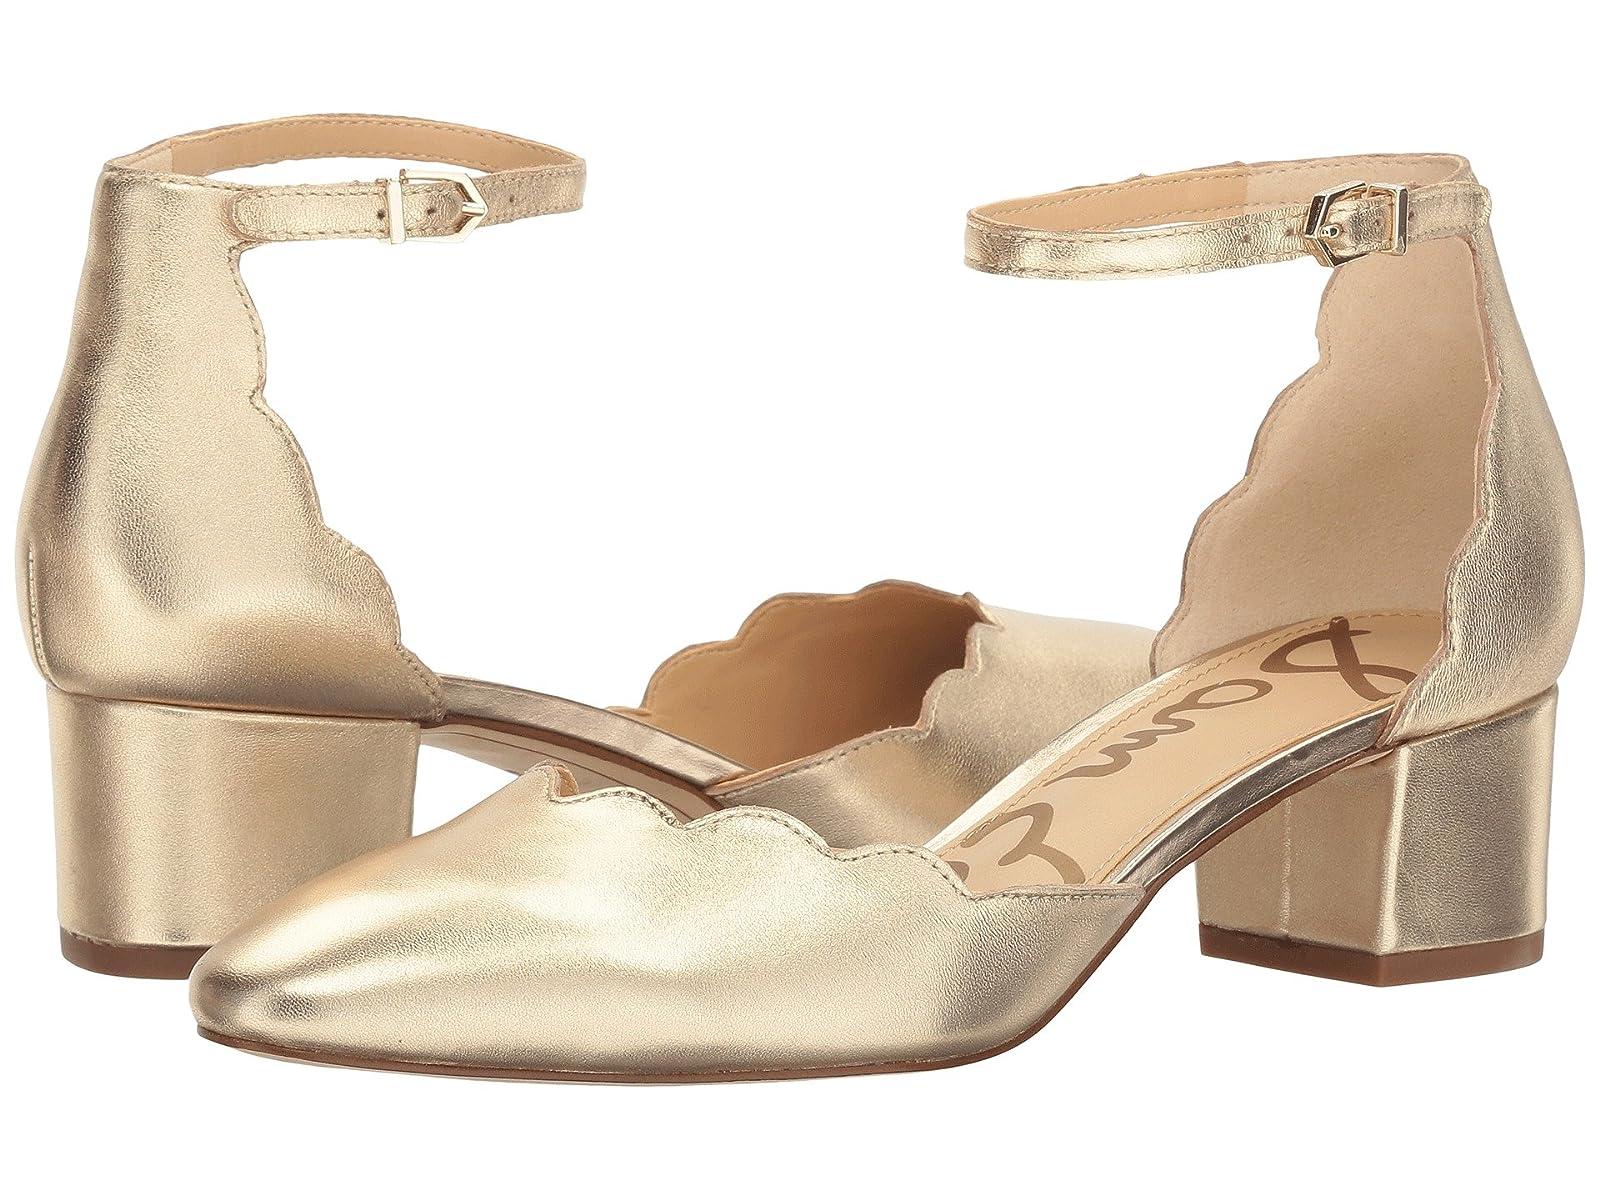 Sam Edelman LaraCheap and distinctive eye-catching shoes